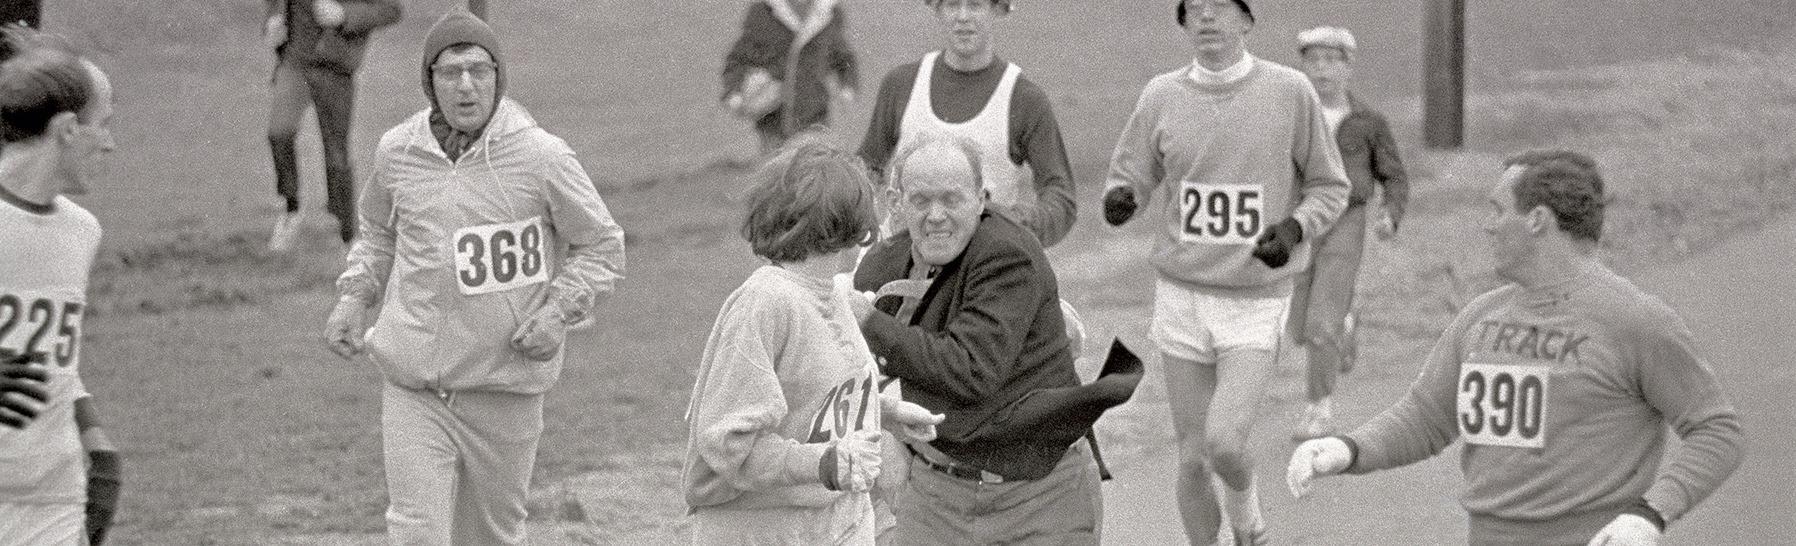 Photo from Boston Marathon 1967